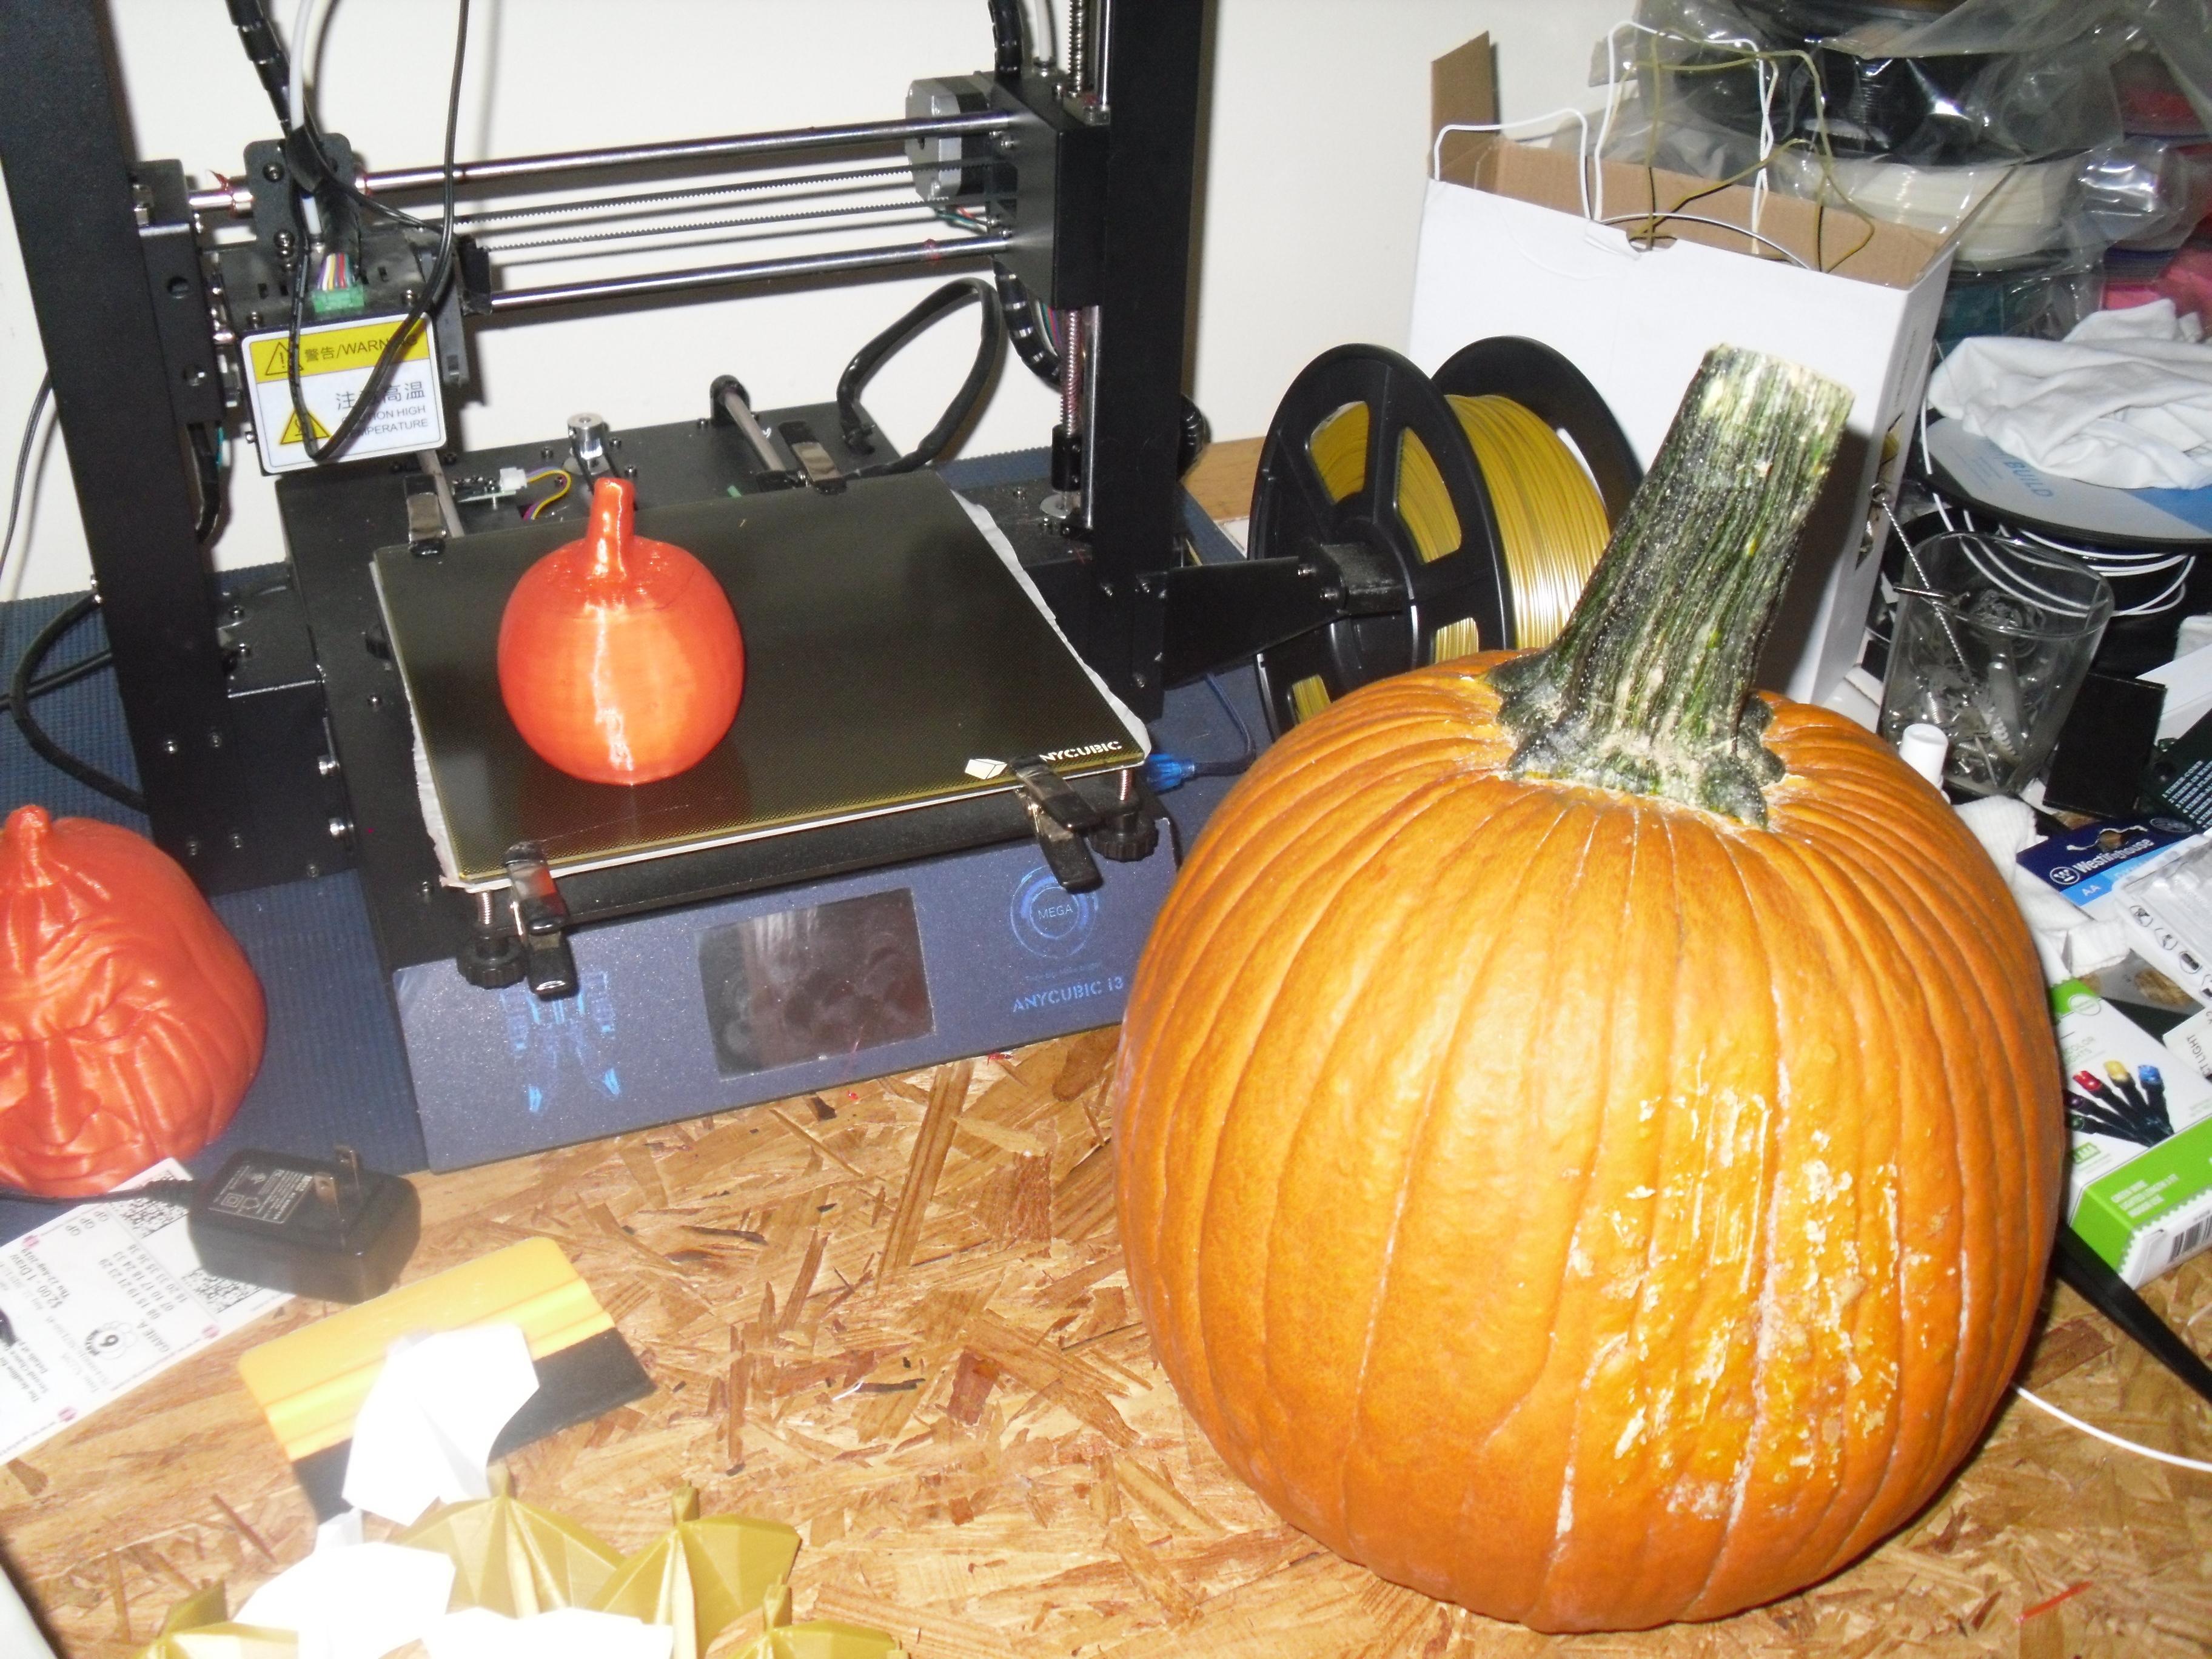 SDC10001.JPG Download free STL file 3d scann of real pumpkin • 3D print object, liggett1